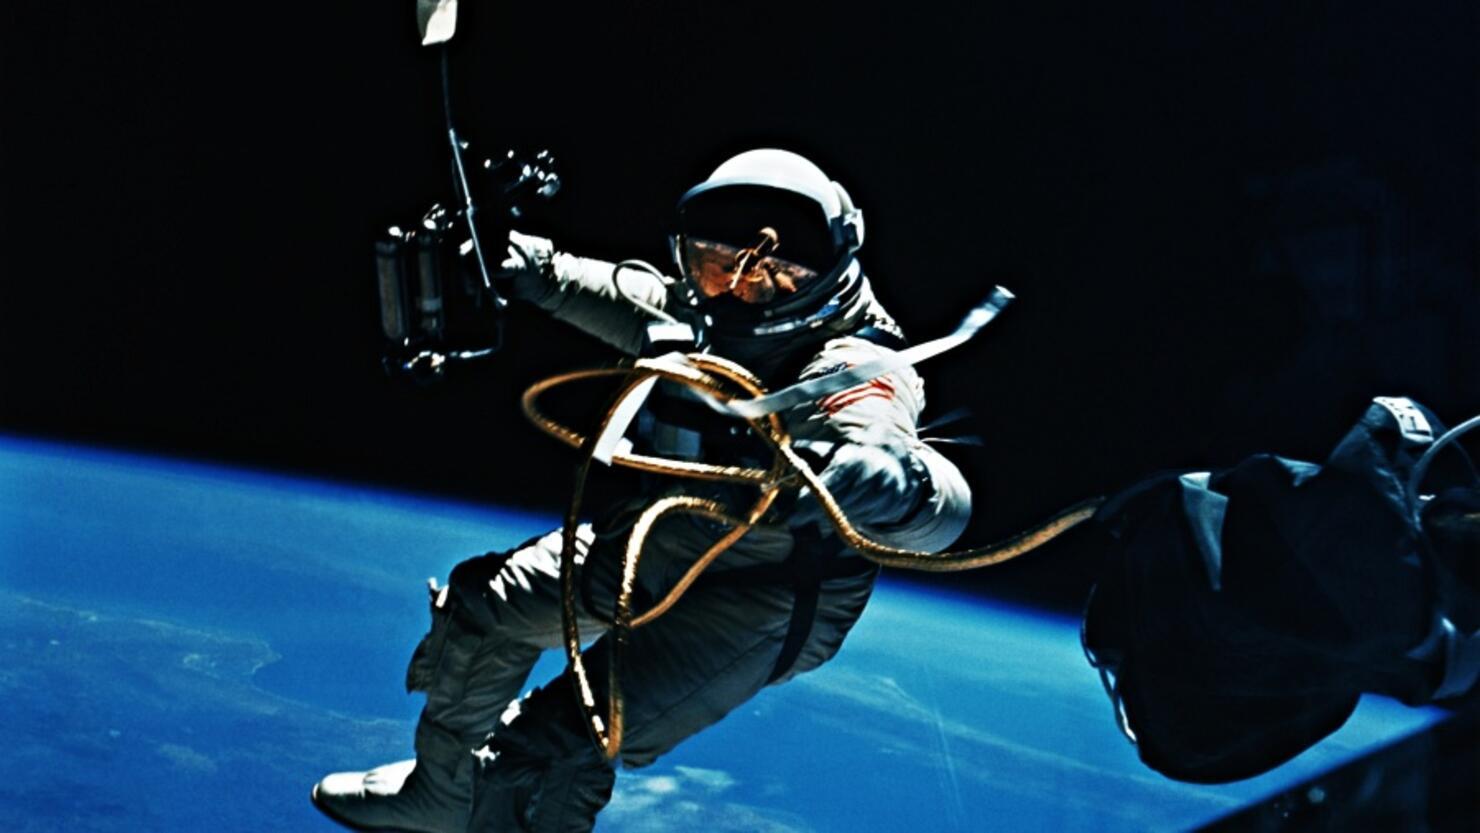 Extra-vehicular Astronaut